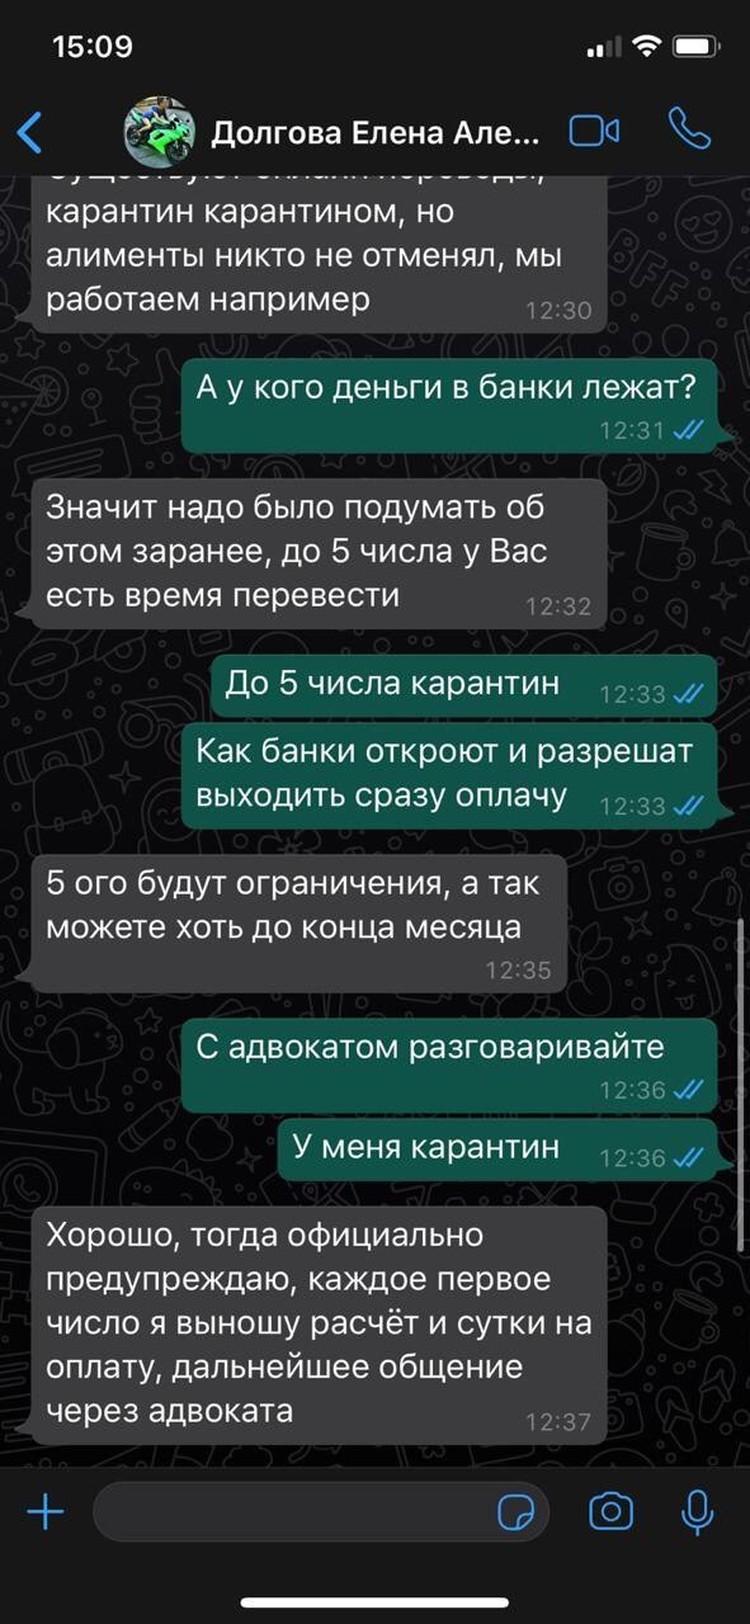 Переписка Тарасова с судебным приставом.